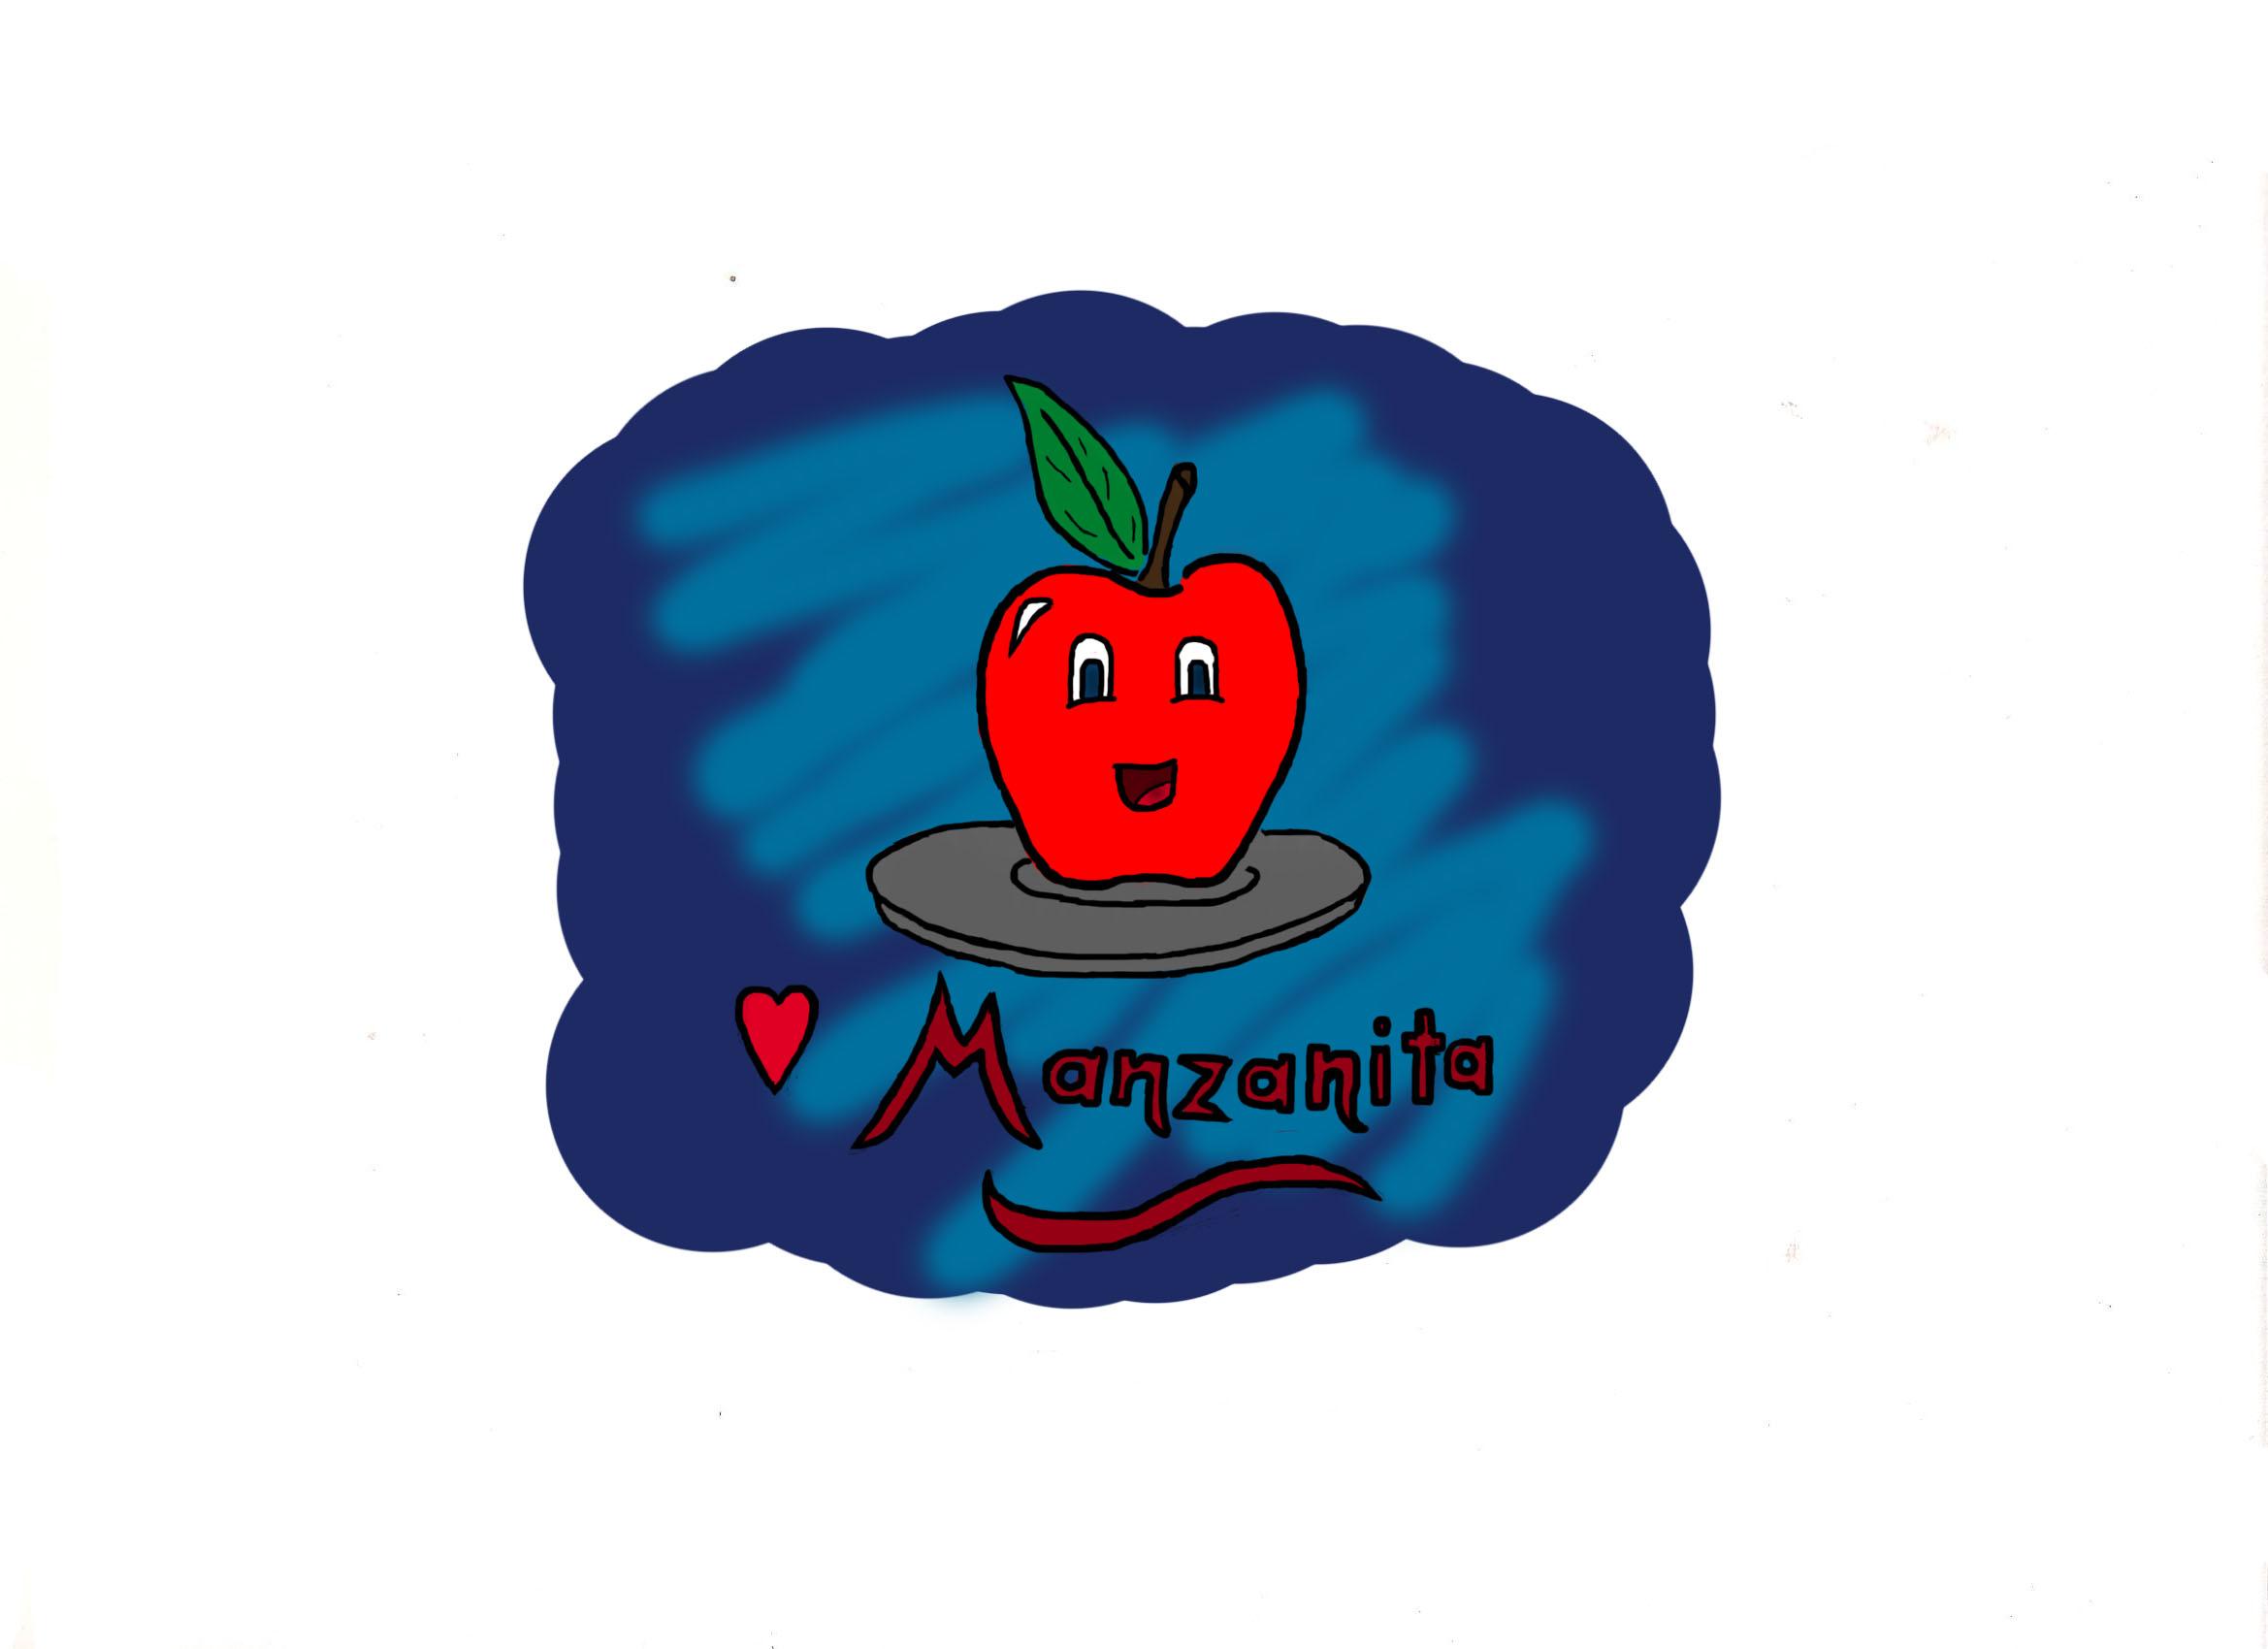 Manzanita~